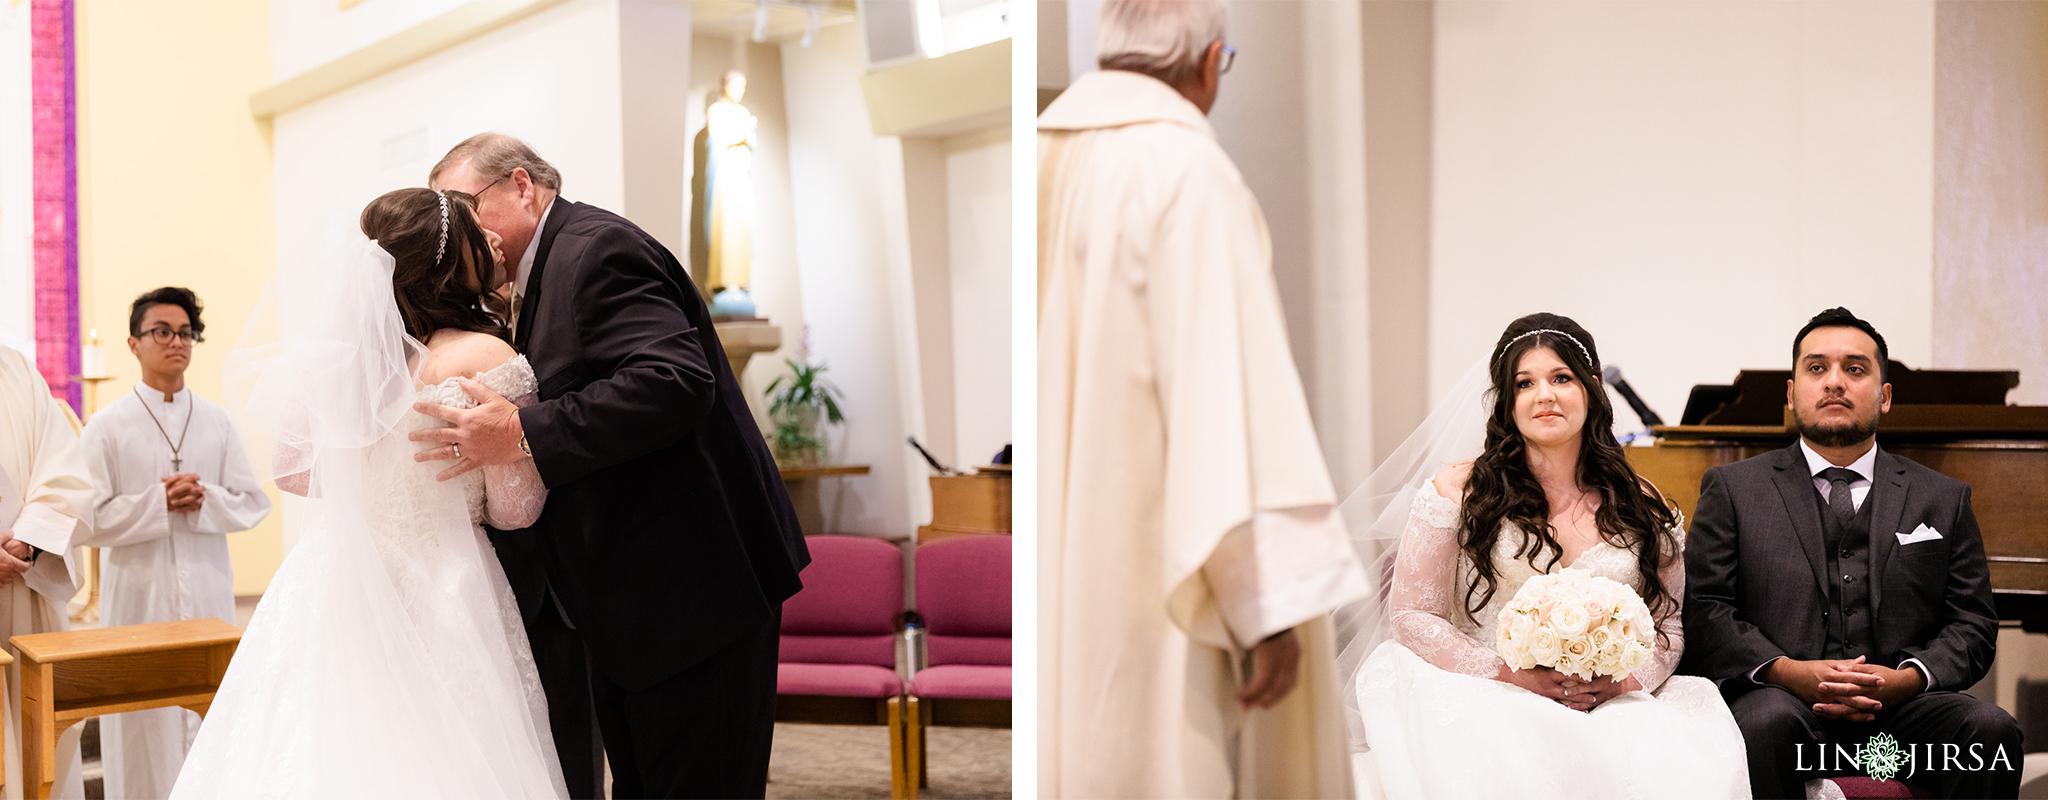 14 Saint Joseph Catholic Church Placentia Wedding Photography